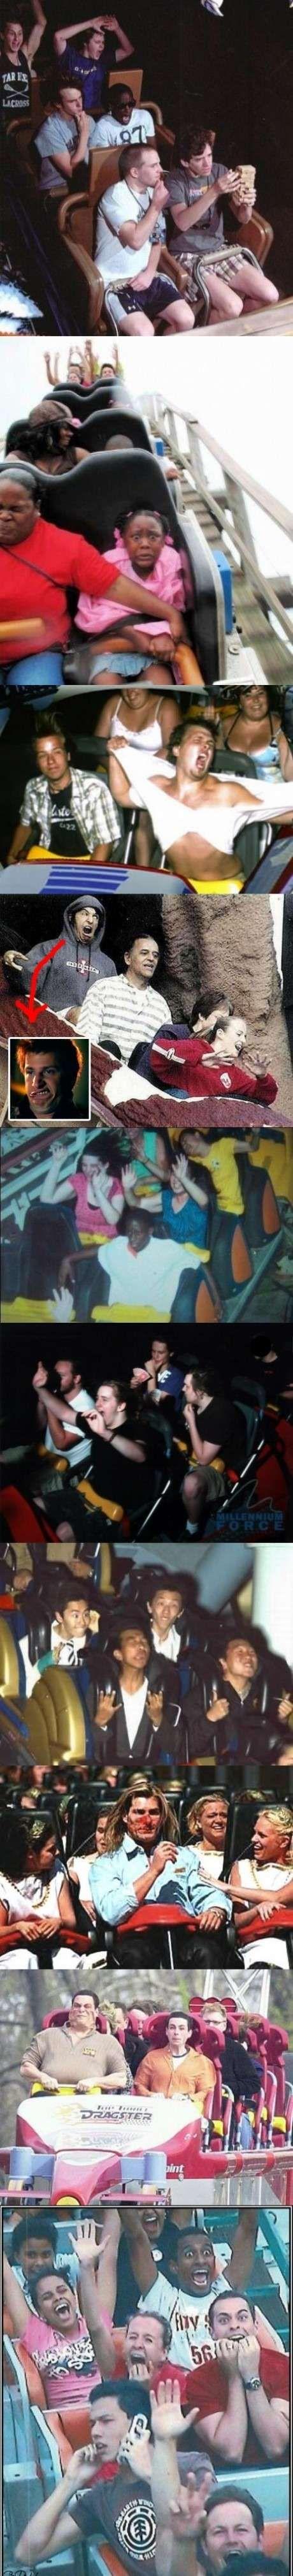 best roller coaster faces